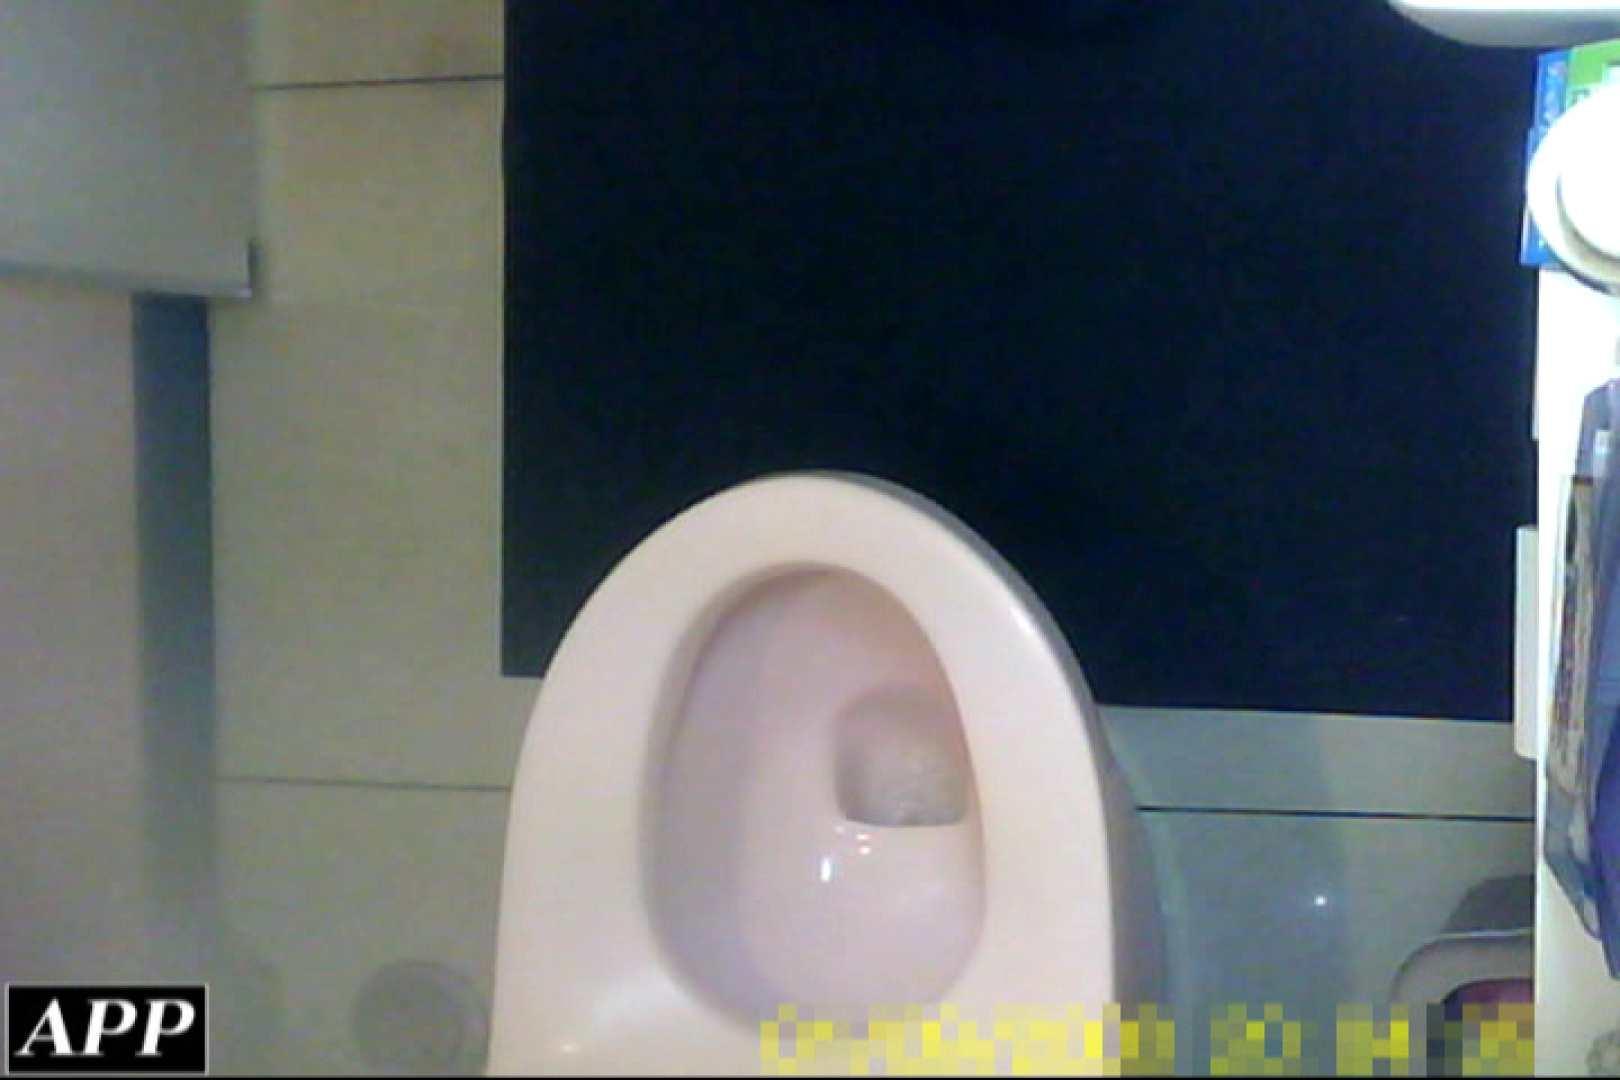 3視点洗面所 vol.63 OLハメ撮り  97Pix 23